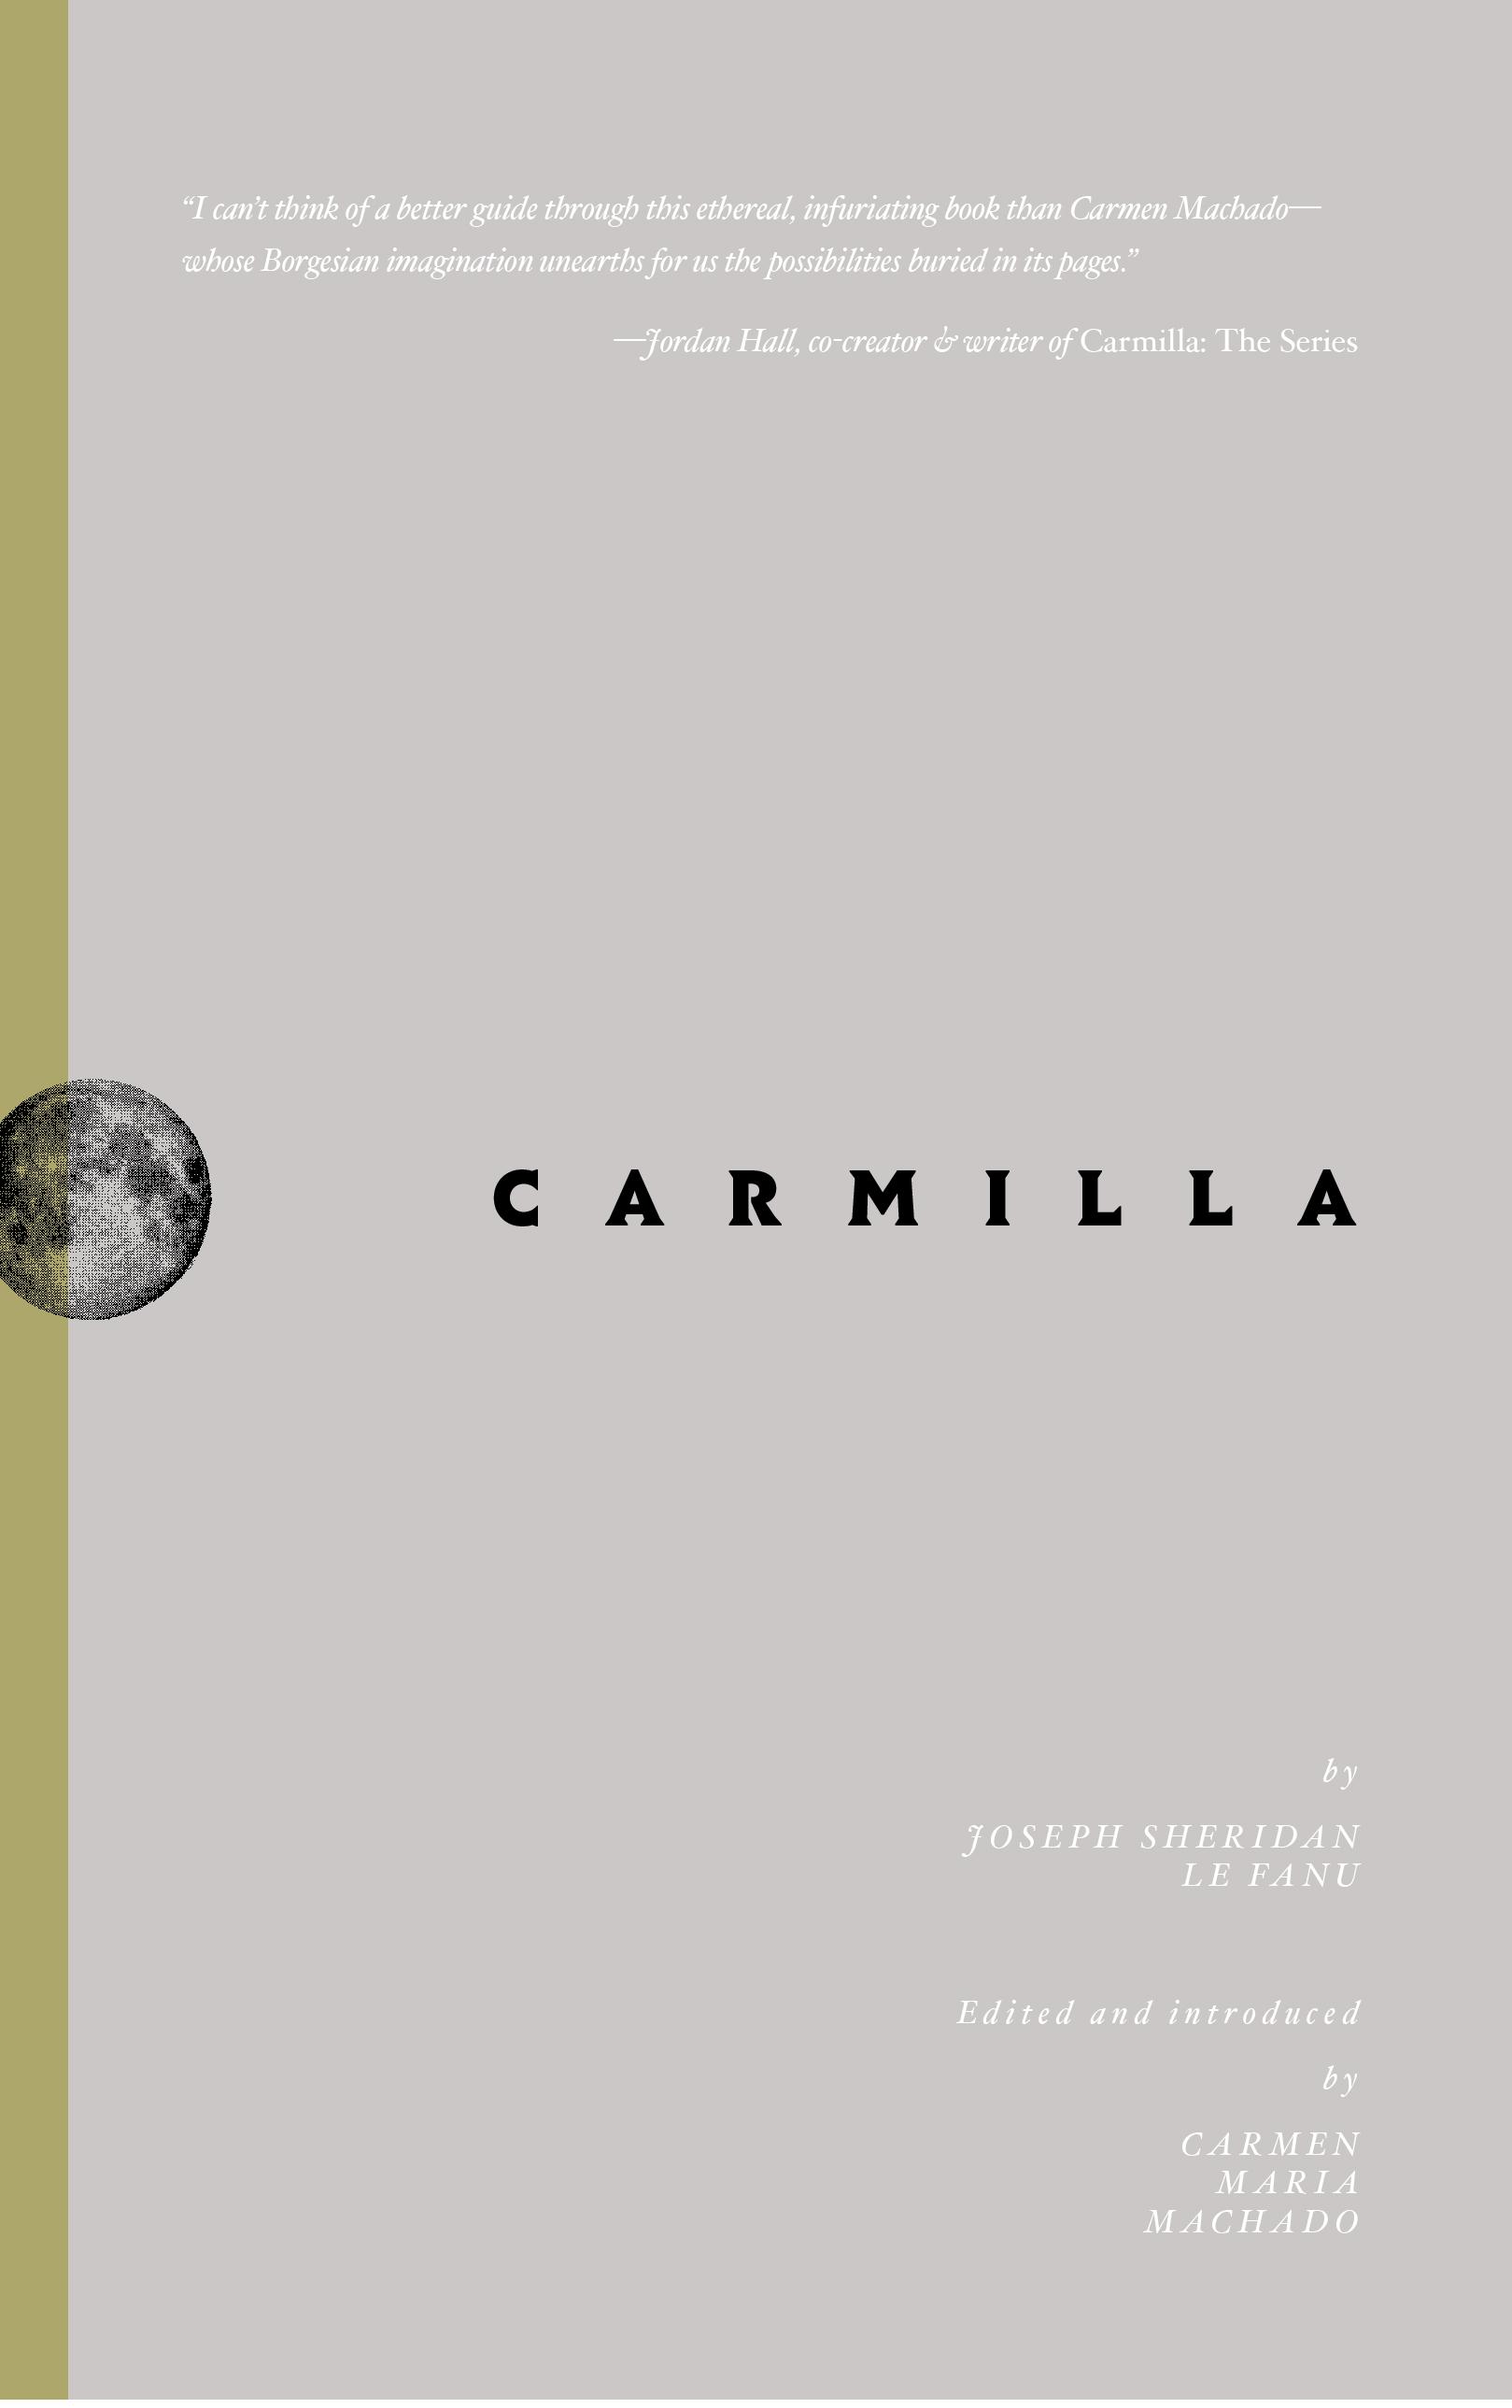 CARMILLA-kindle-EPUB-cover.jpg